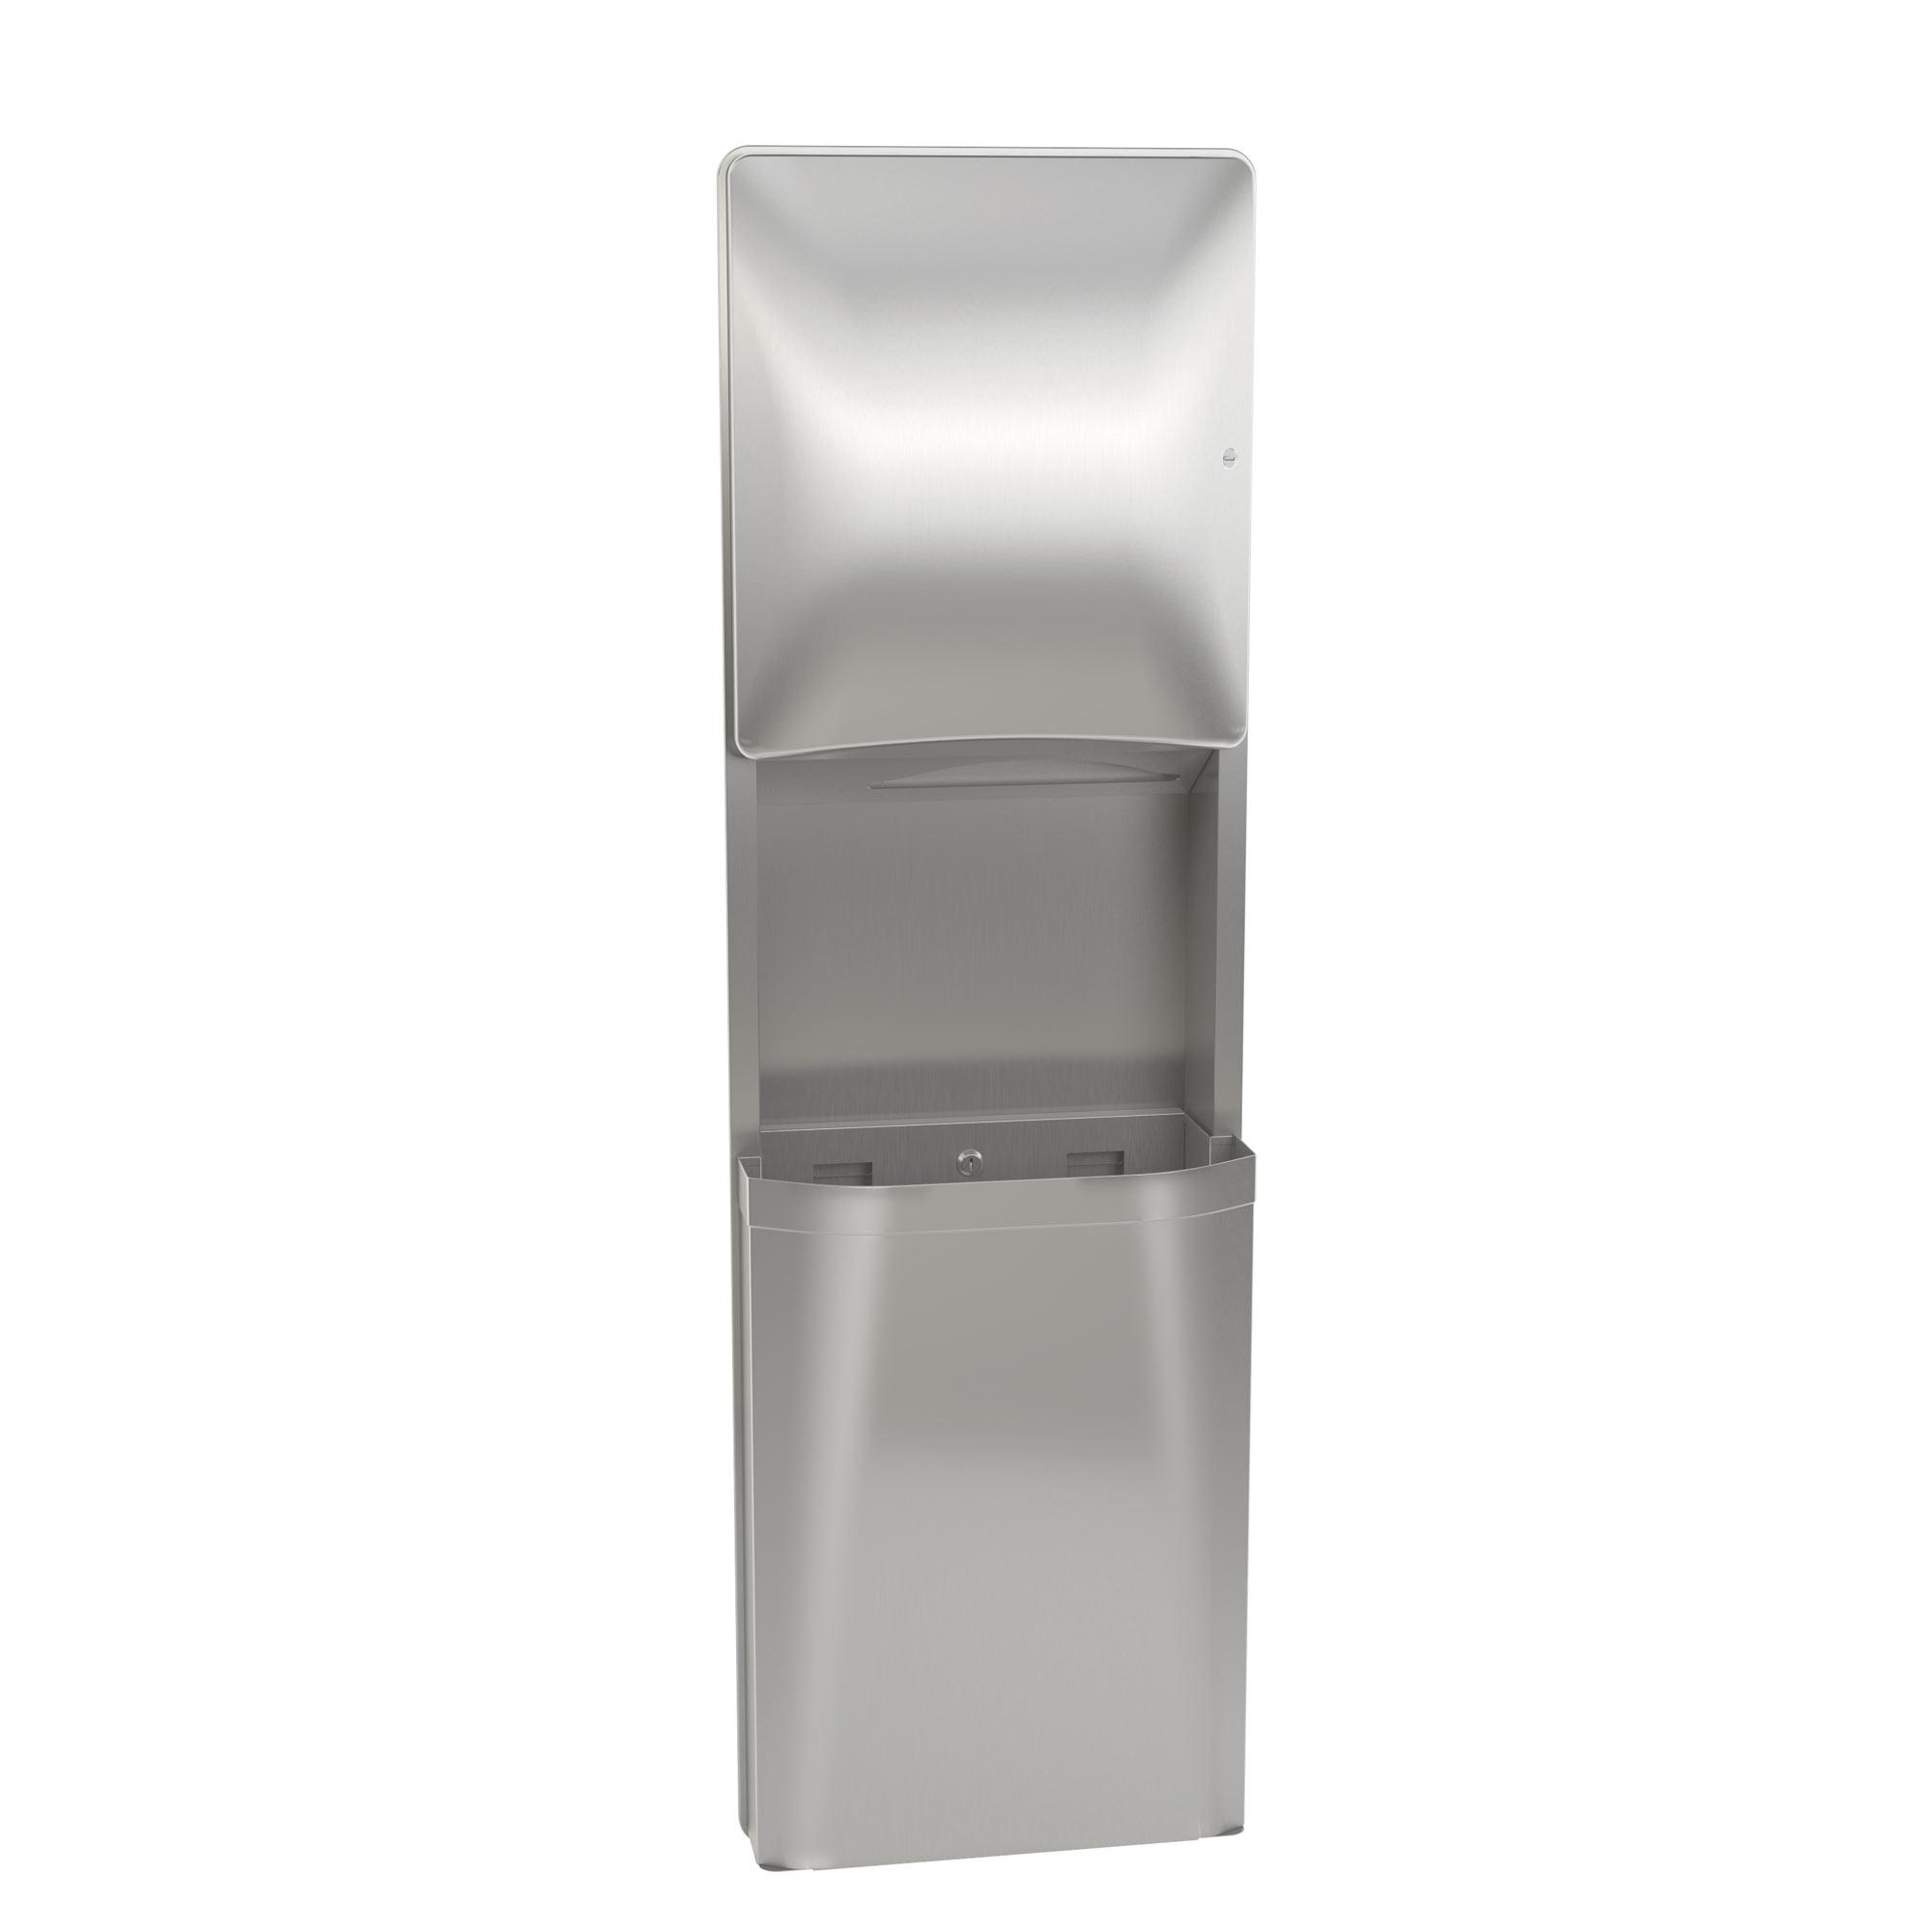 Bradley 2A05 Recessed Folded Towel Dispenser & 12 gal. Waste Receptacle